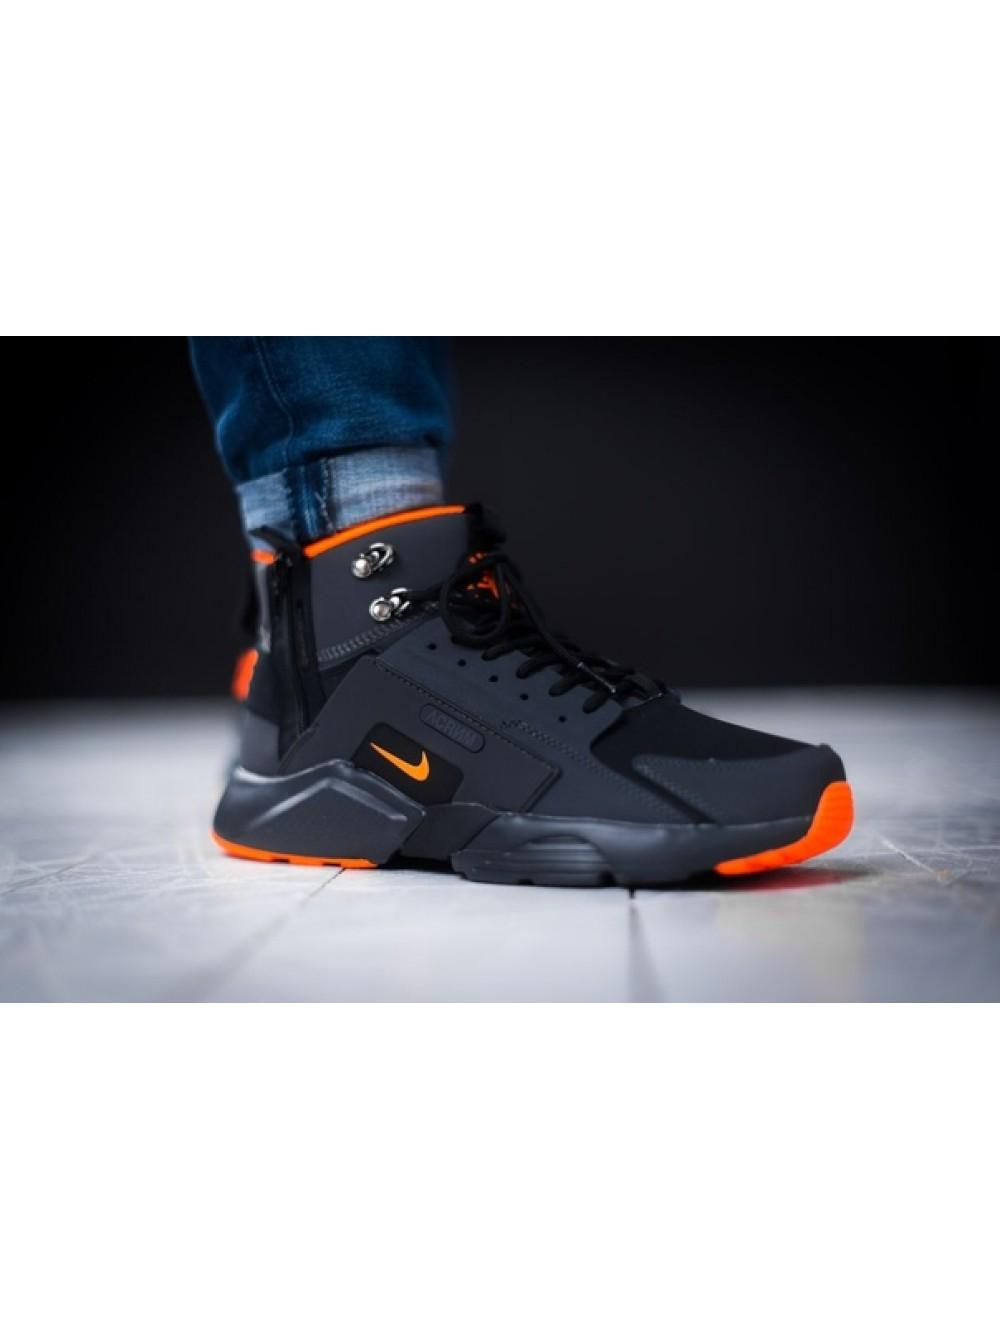 sale retailer 09fab c1b17 Кроссовки ACRONYM x Nike Huarache City MID Leather